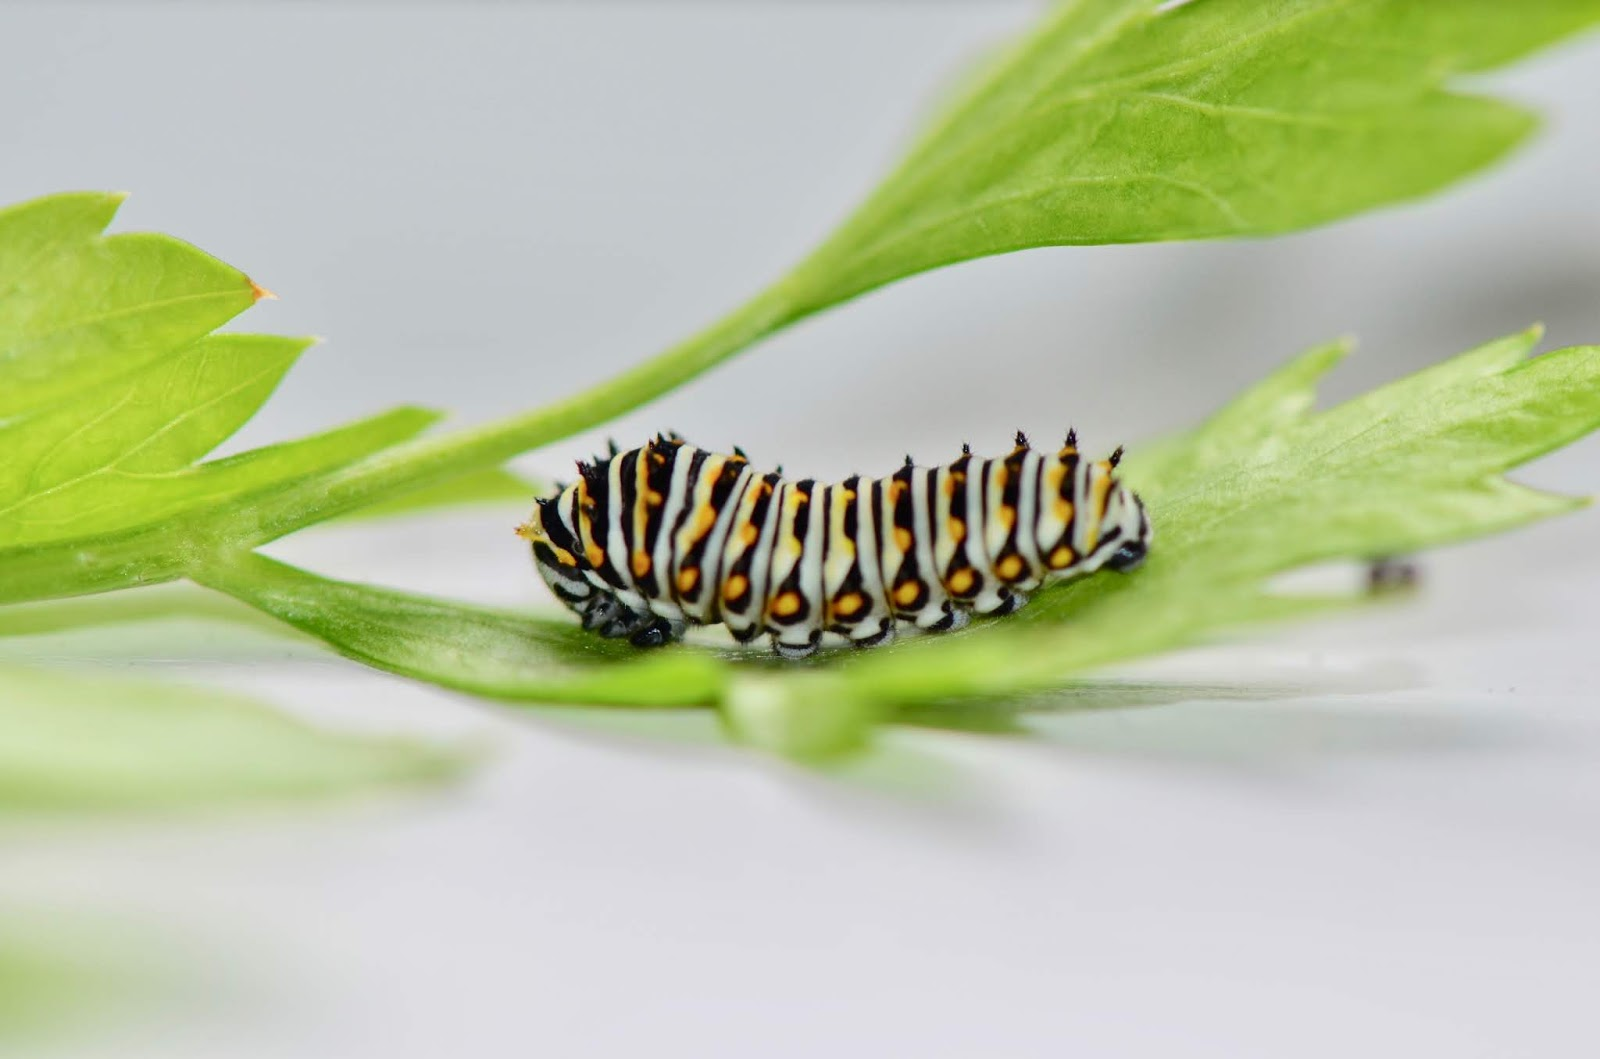 urban wildlife guide caterpillar decisions rh urbanwildlifeguide net Caterpillars Identification Guide Swallowtail Caterpillar